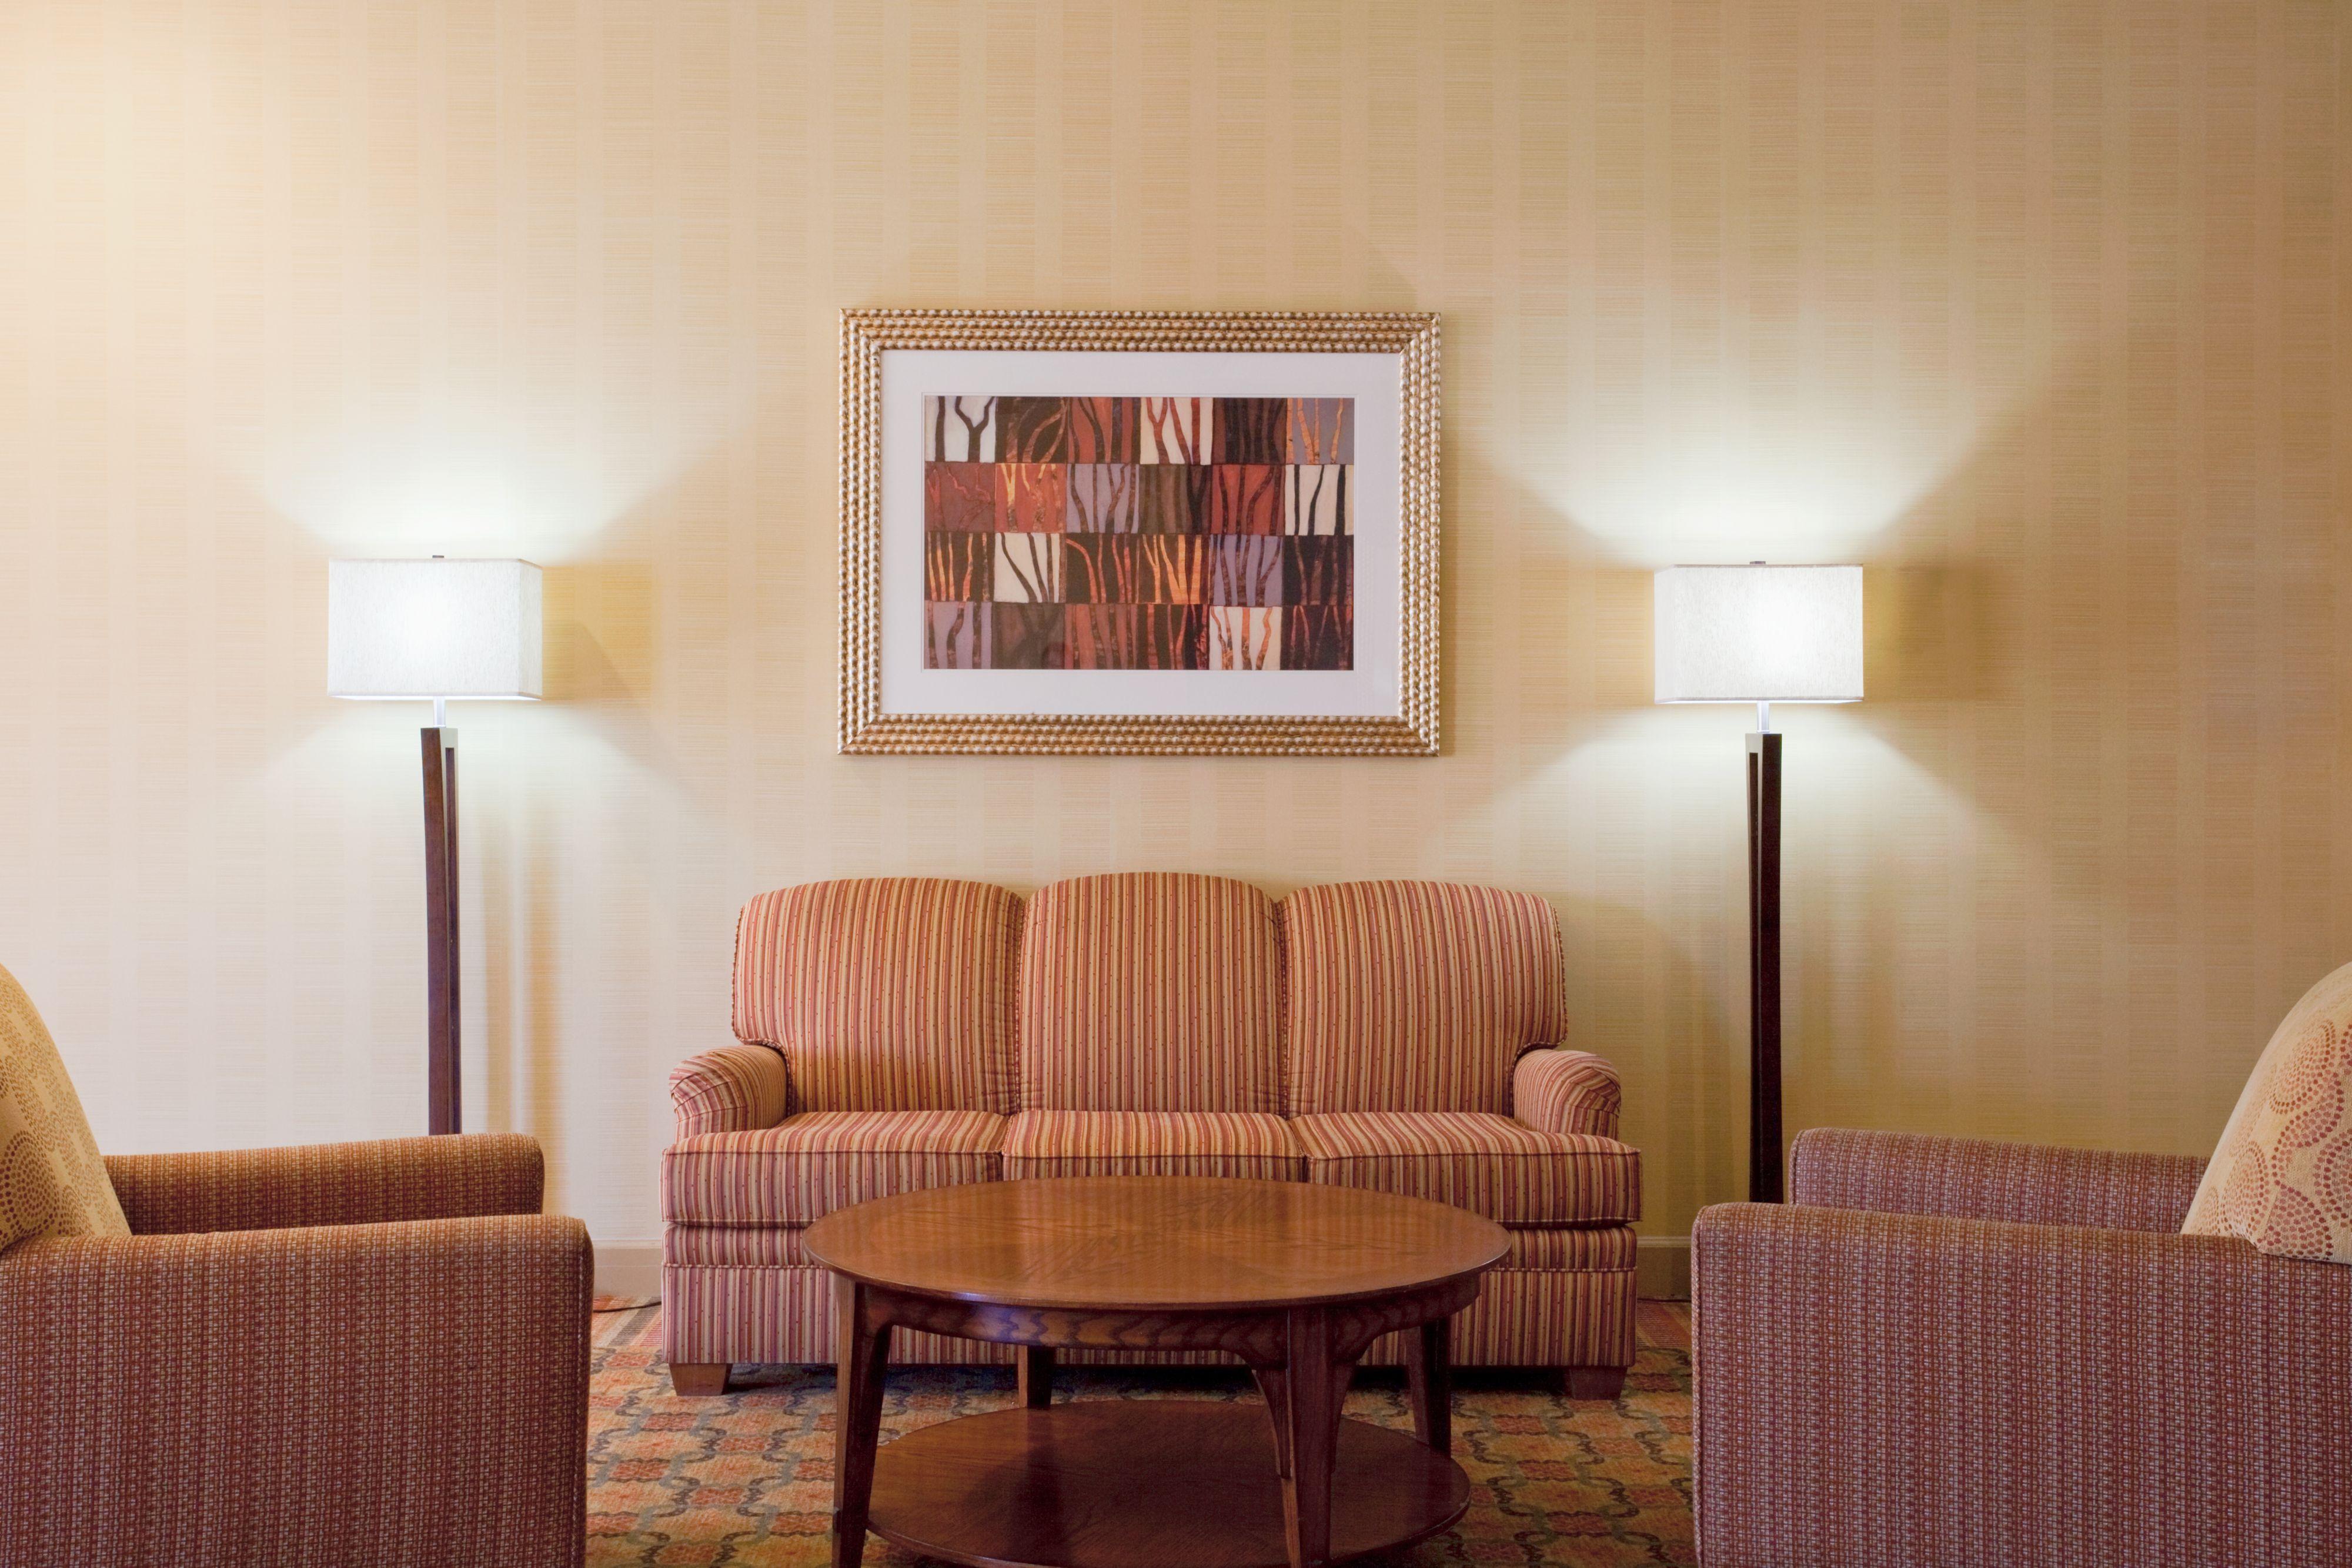 Holiday Inn Reno-Sparks image 8